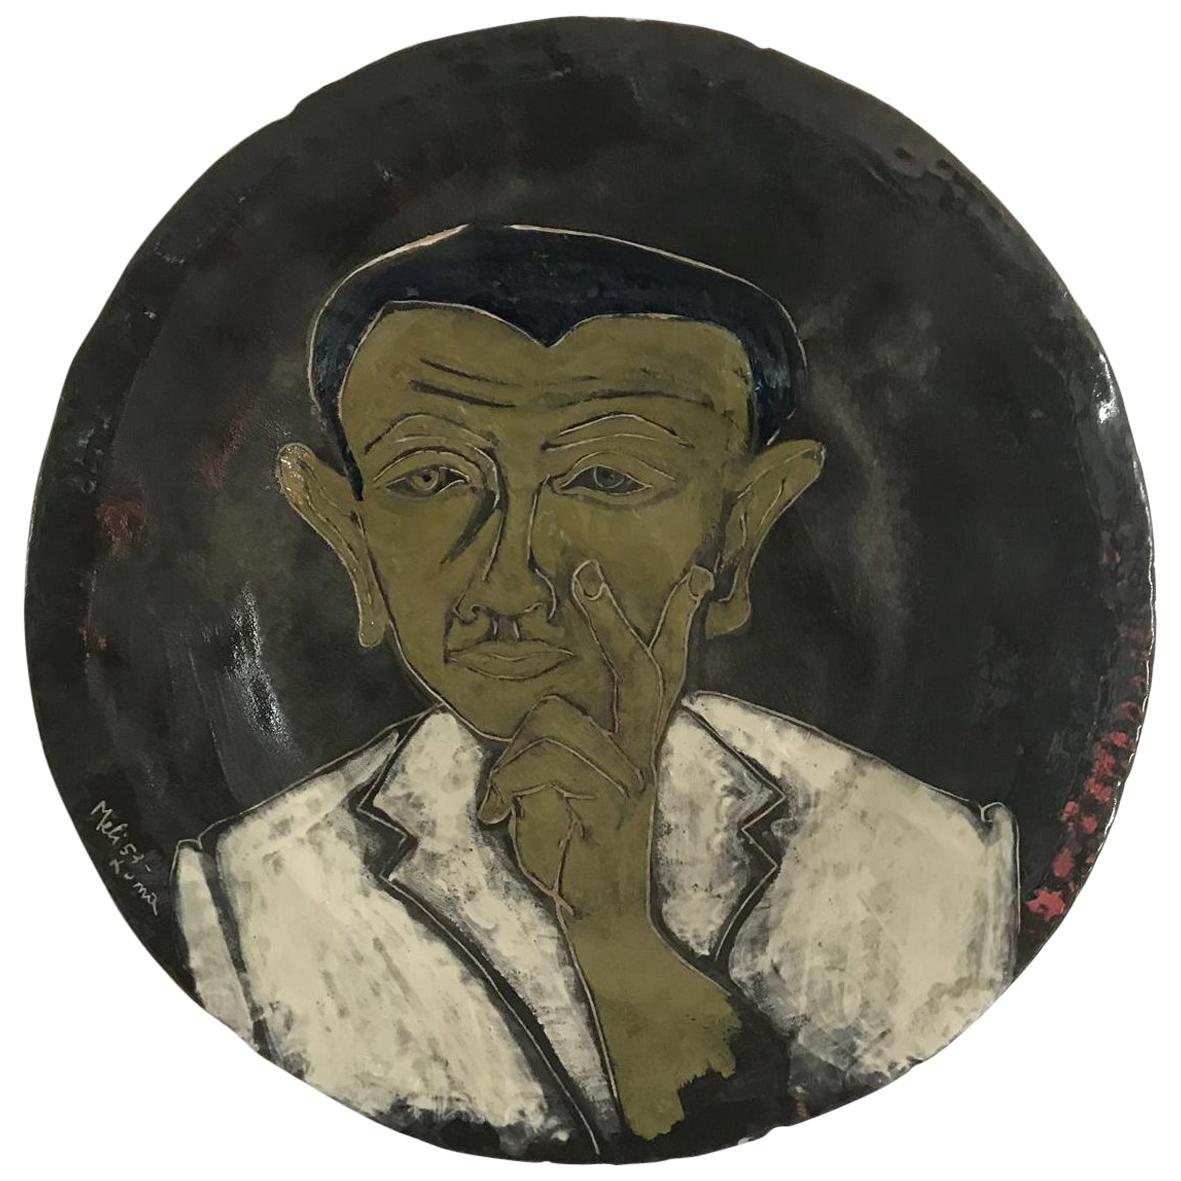 Plate of Salvatore Meli, Self Portrait, Italy, 1960